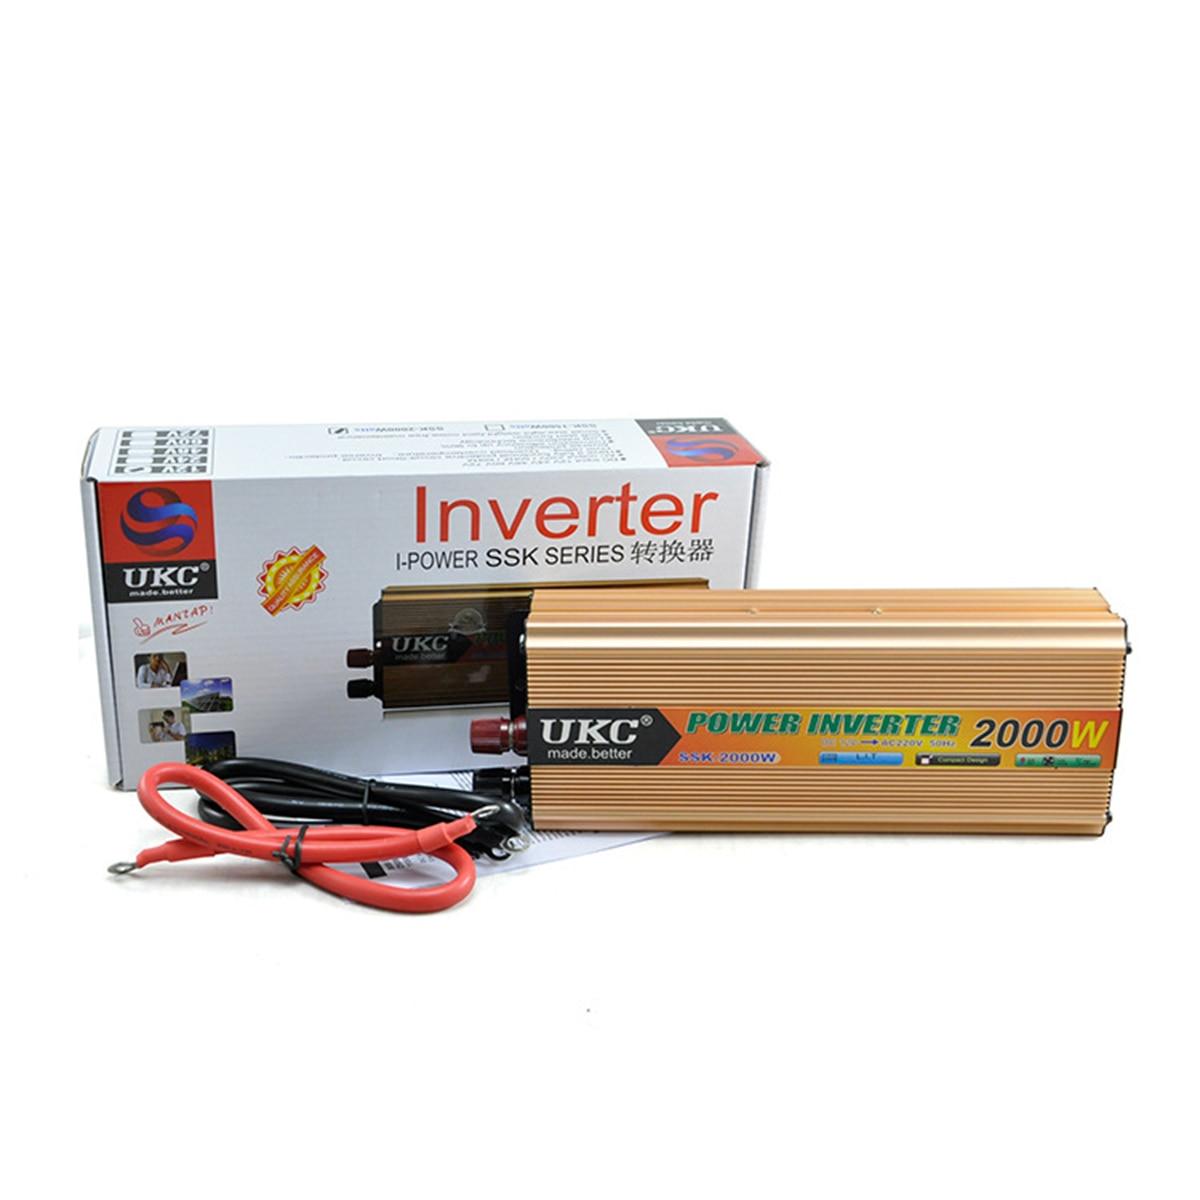 Car Inverter 12V 220V 2000W 50HZ with Battery Charger Power DC 12V to AC 220V CY178-CN-2<br><br>Aliexpress